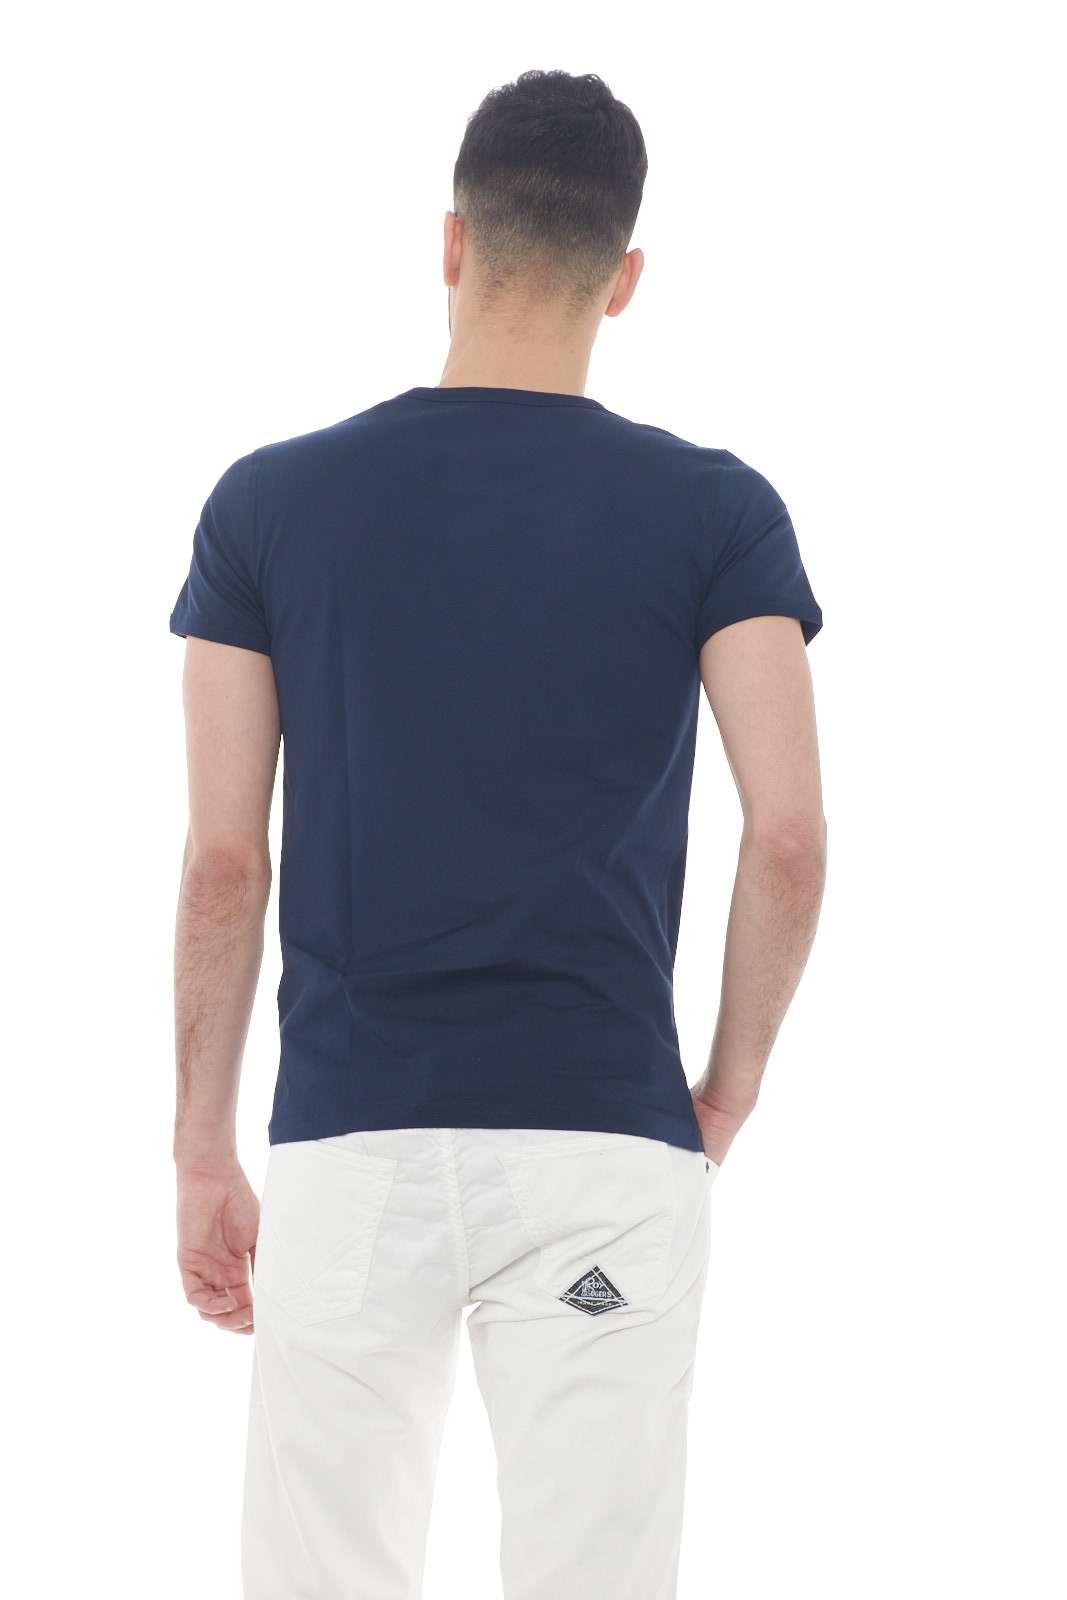 https://www.parmax.com/media/catalog/product/a/i/PE-outlet_parmax-t-shirt-Museum-MS19BEU-C.jpg